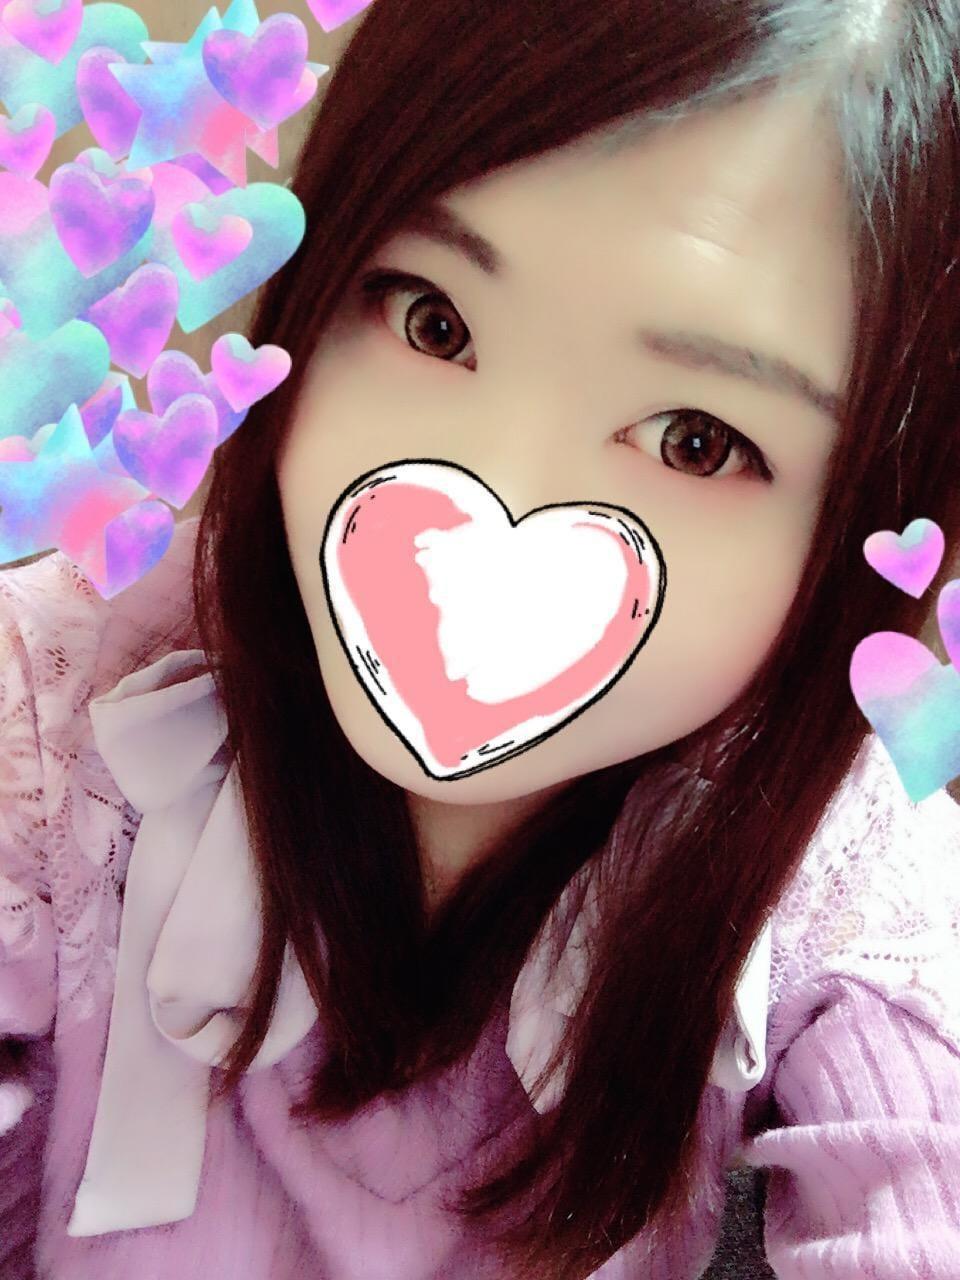 「February 23rd ★」02/23(02/23) 17:54 | まどかの写メ・風俗動画